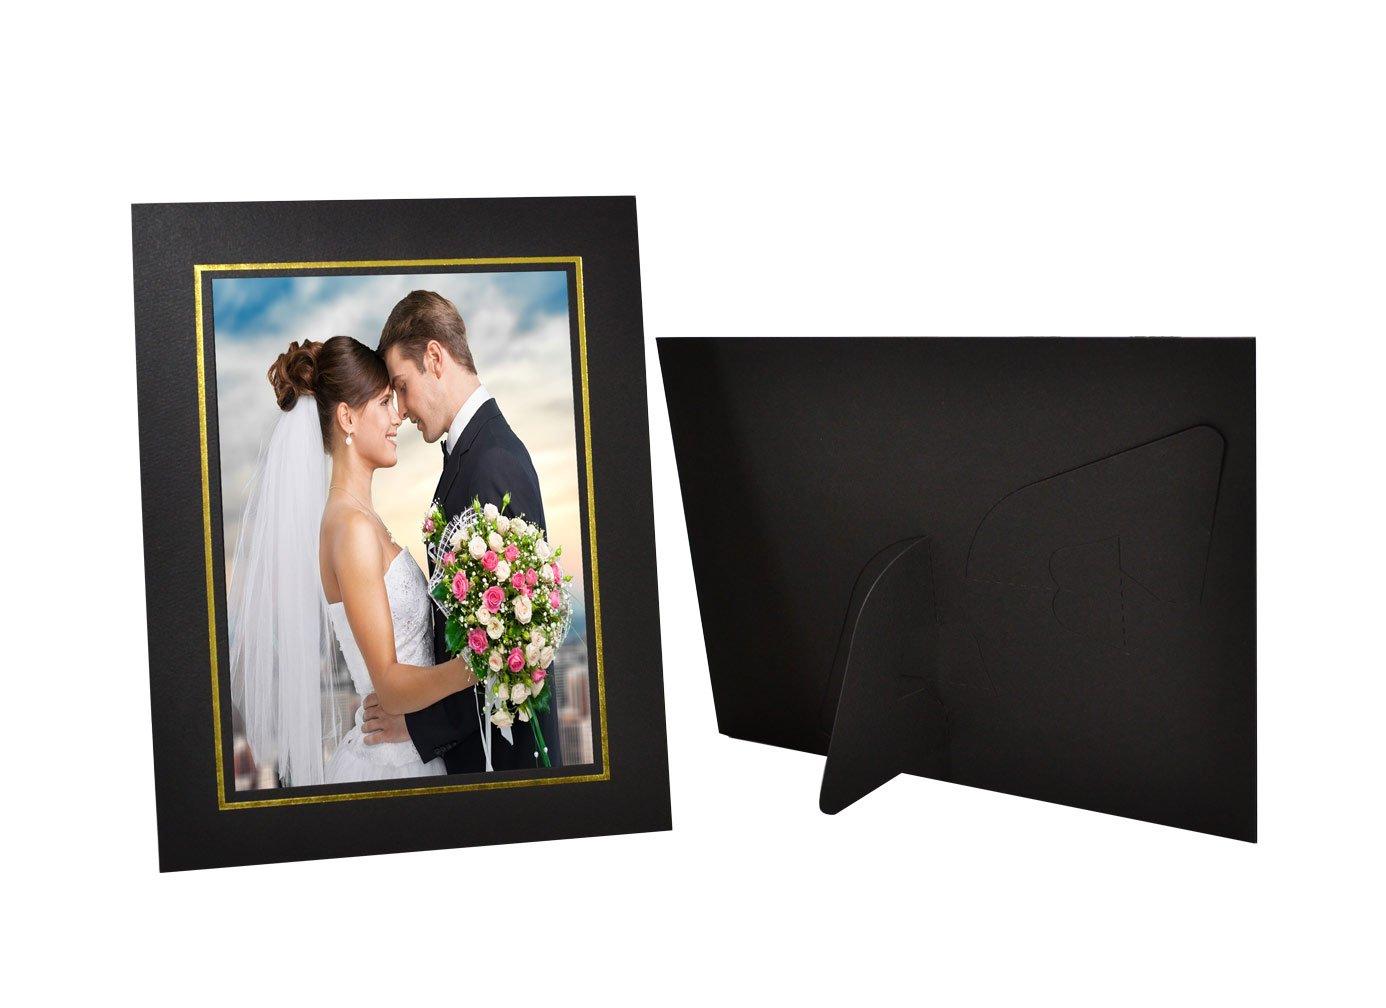 Cardboard Photo Easel Frame for 5x7 Photo Golden State Art Black Pack of 25